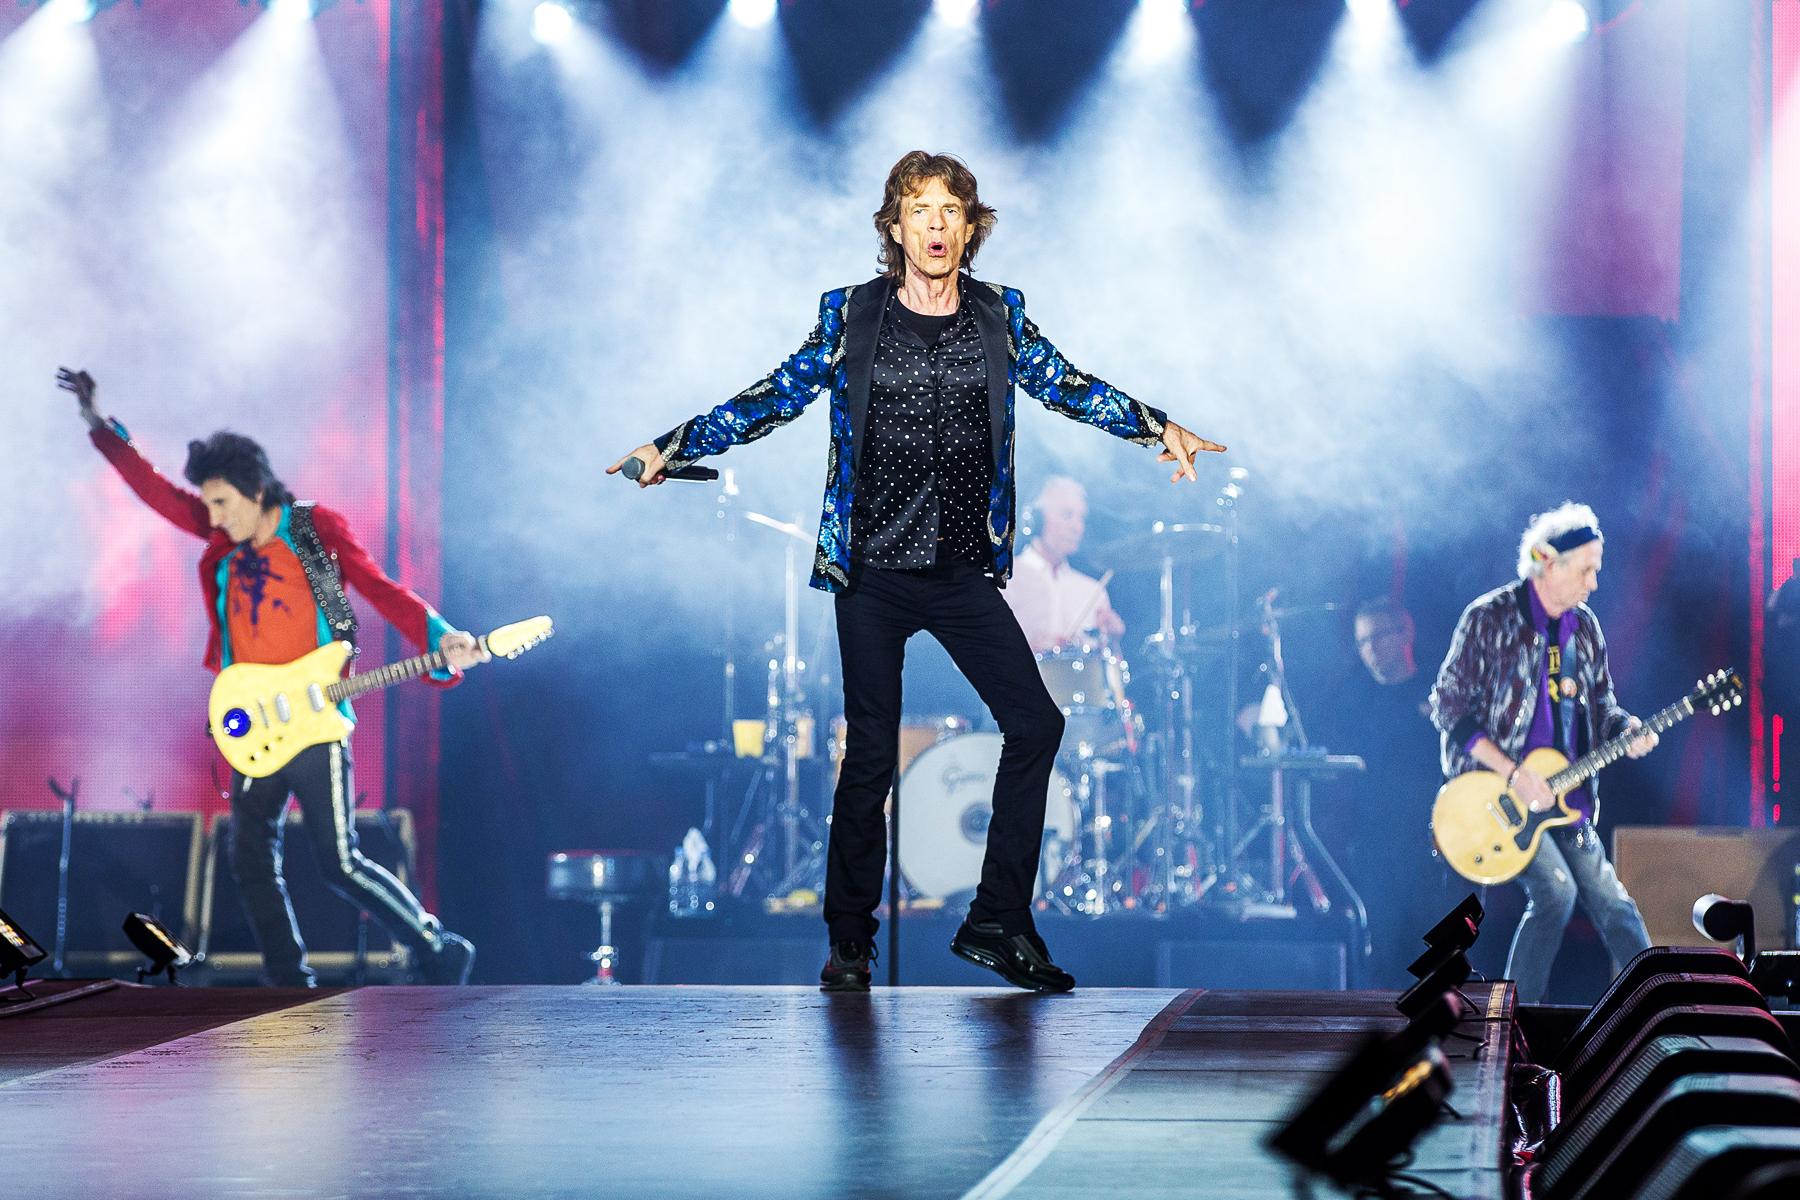 The Rolling Stones Announce 2019 'No Filter' U.S. Stadium Tour